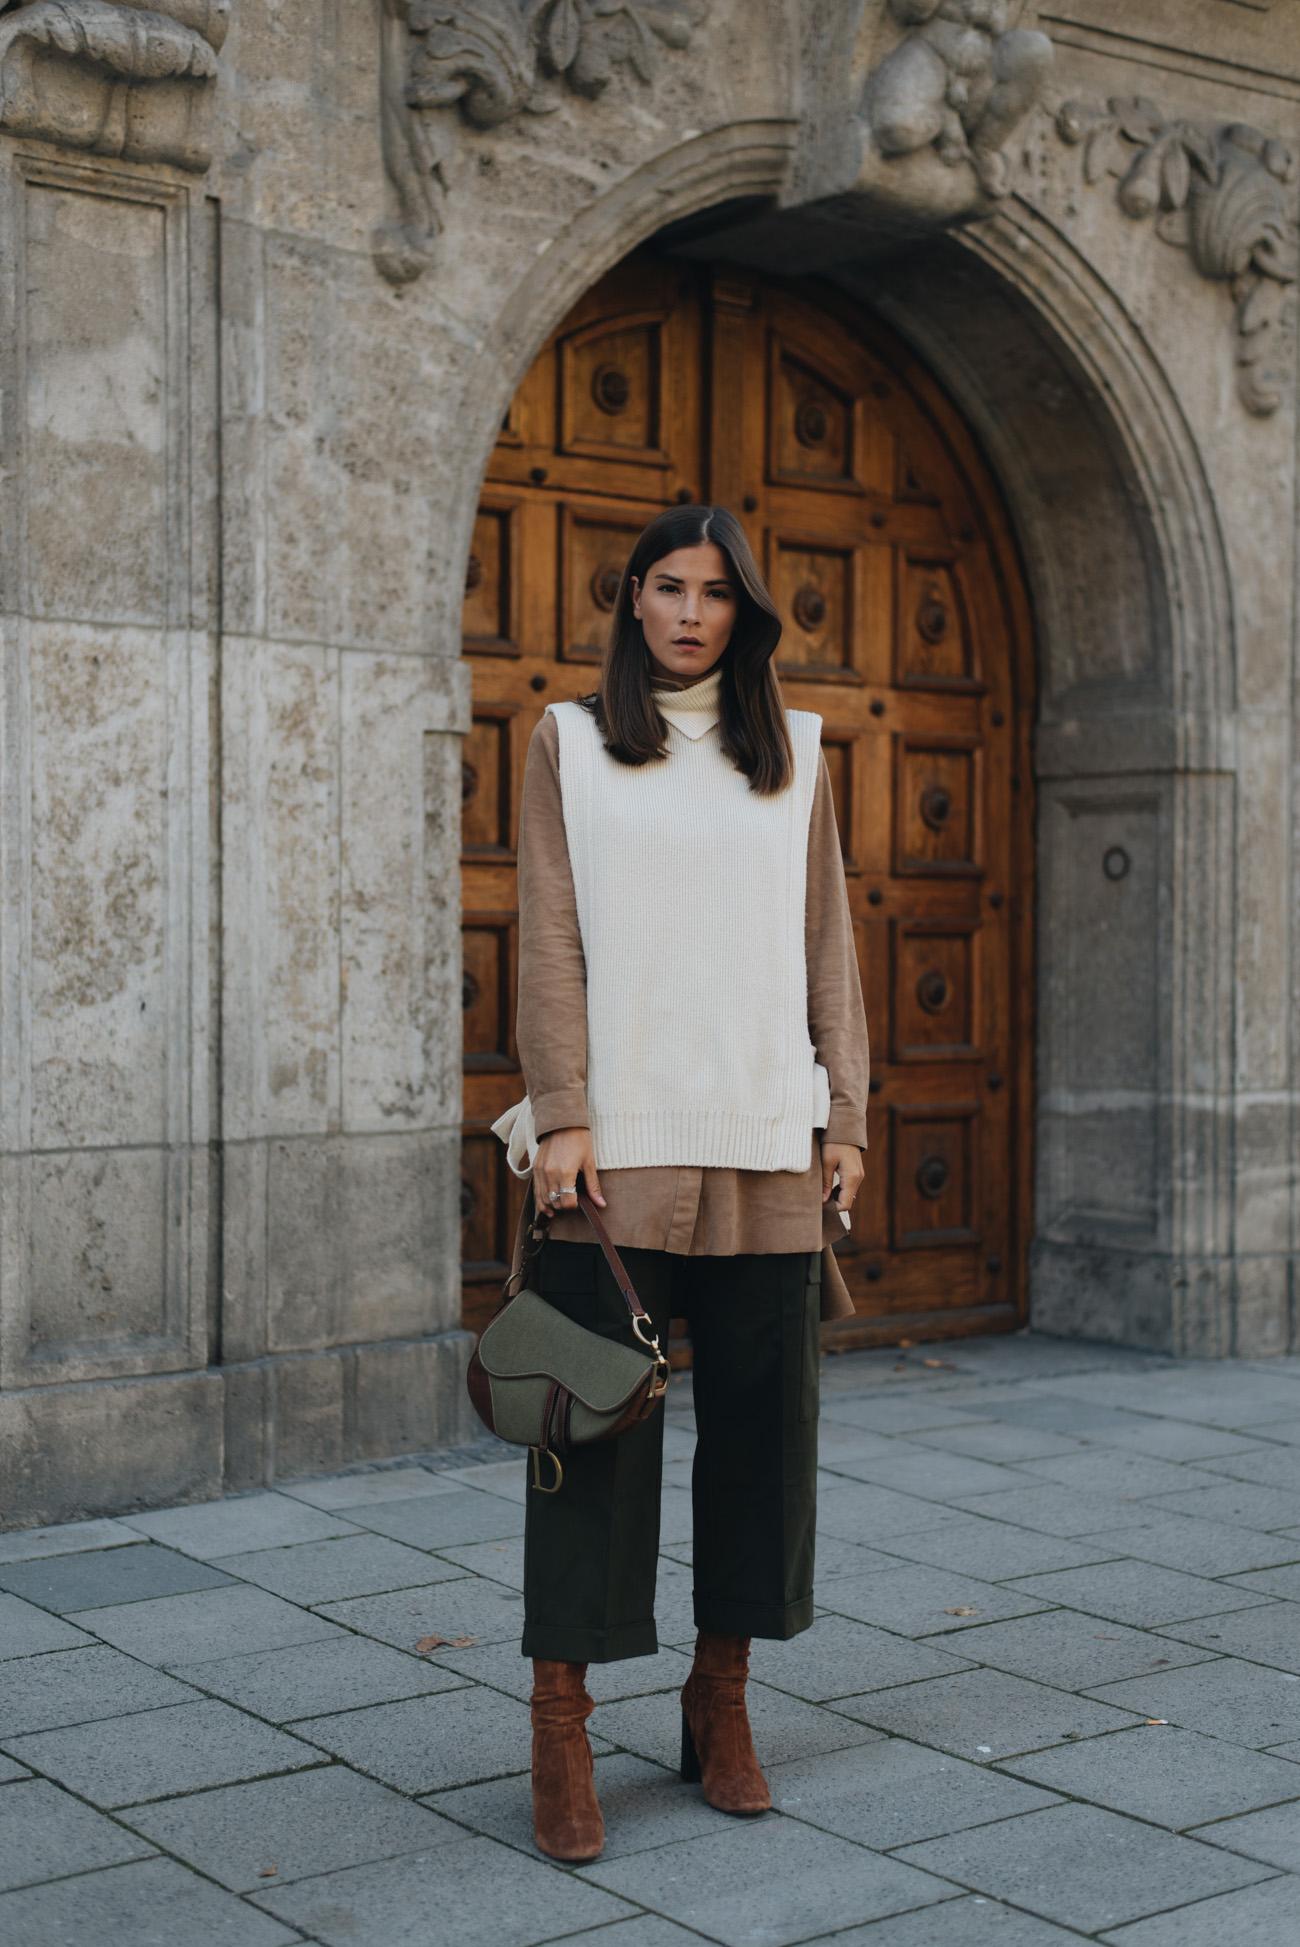 german-fashion-and-lifestyle-blogger-influencer-high-end-luxury-nina-schwichtenberg-fashiioncarpet